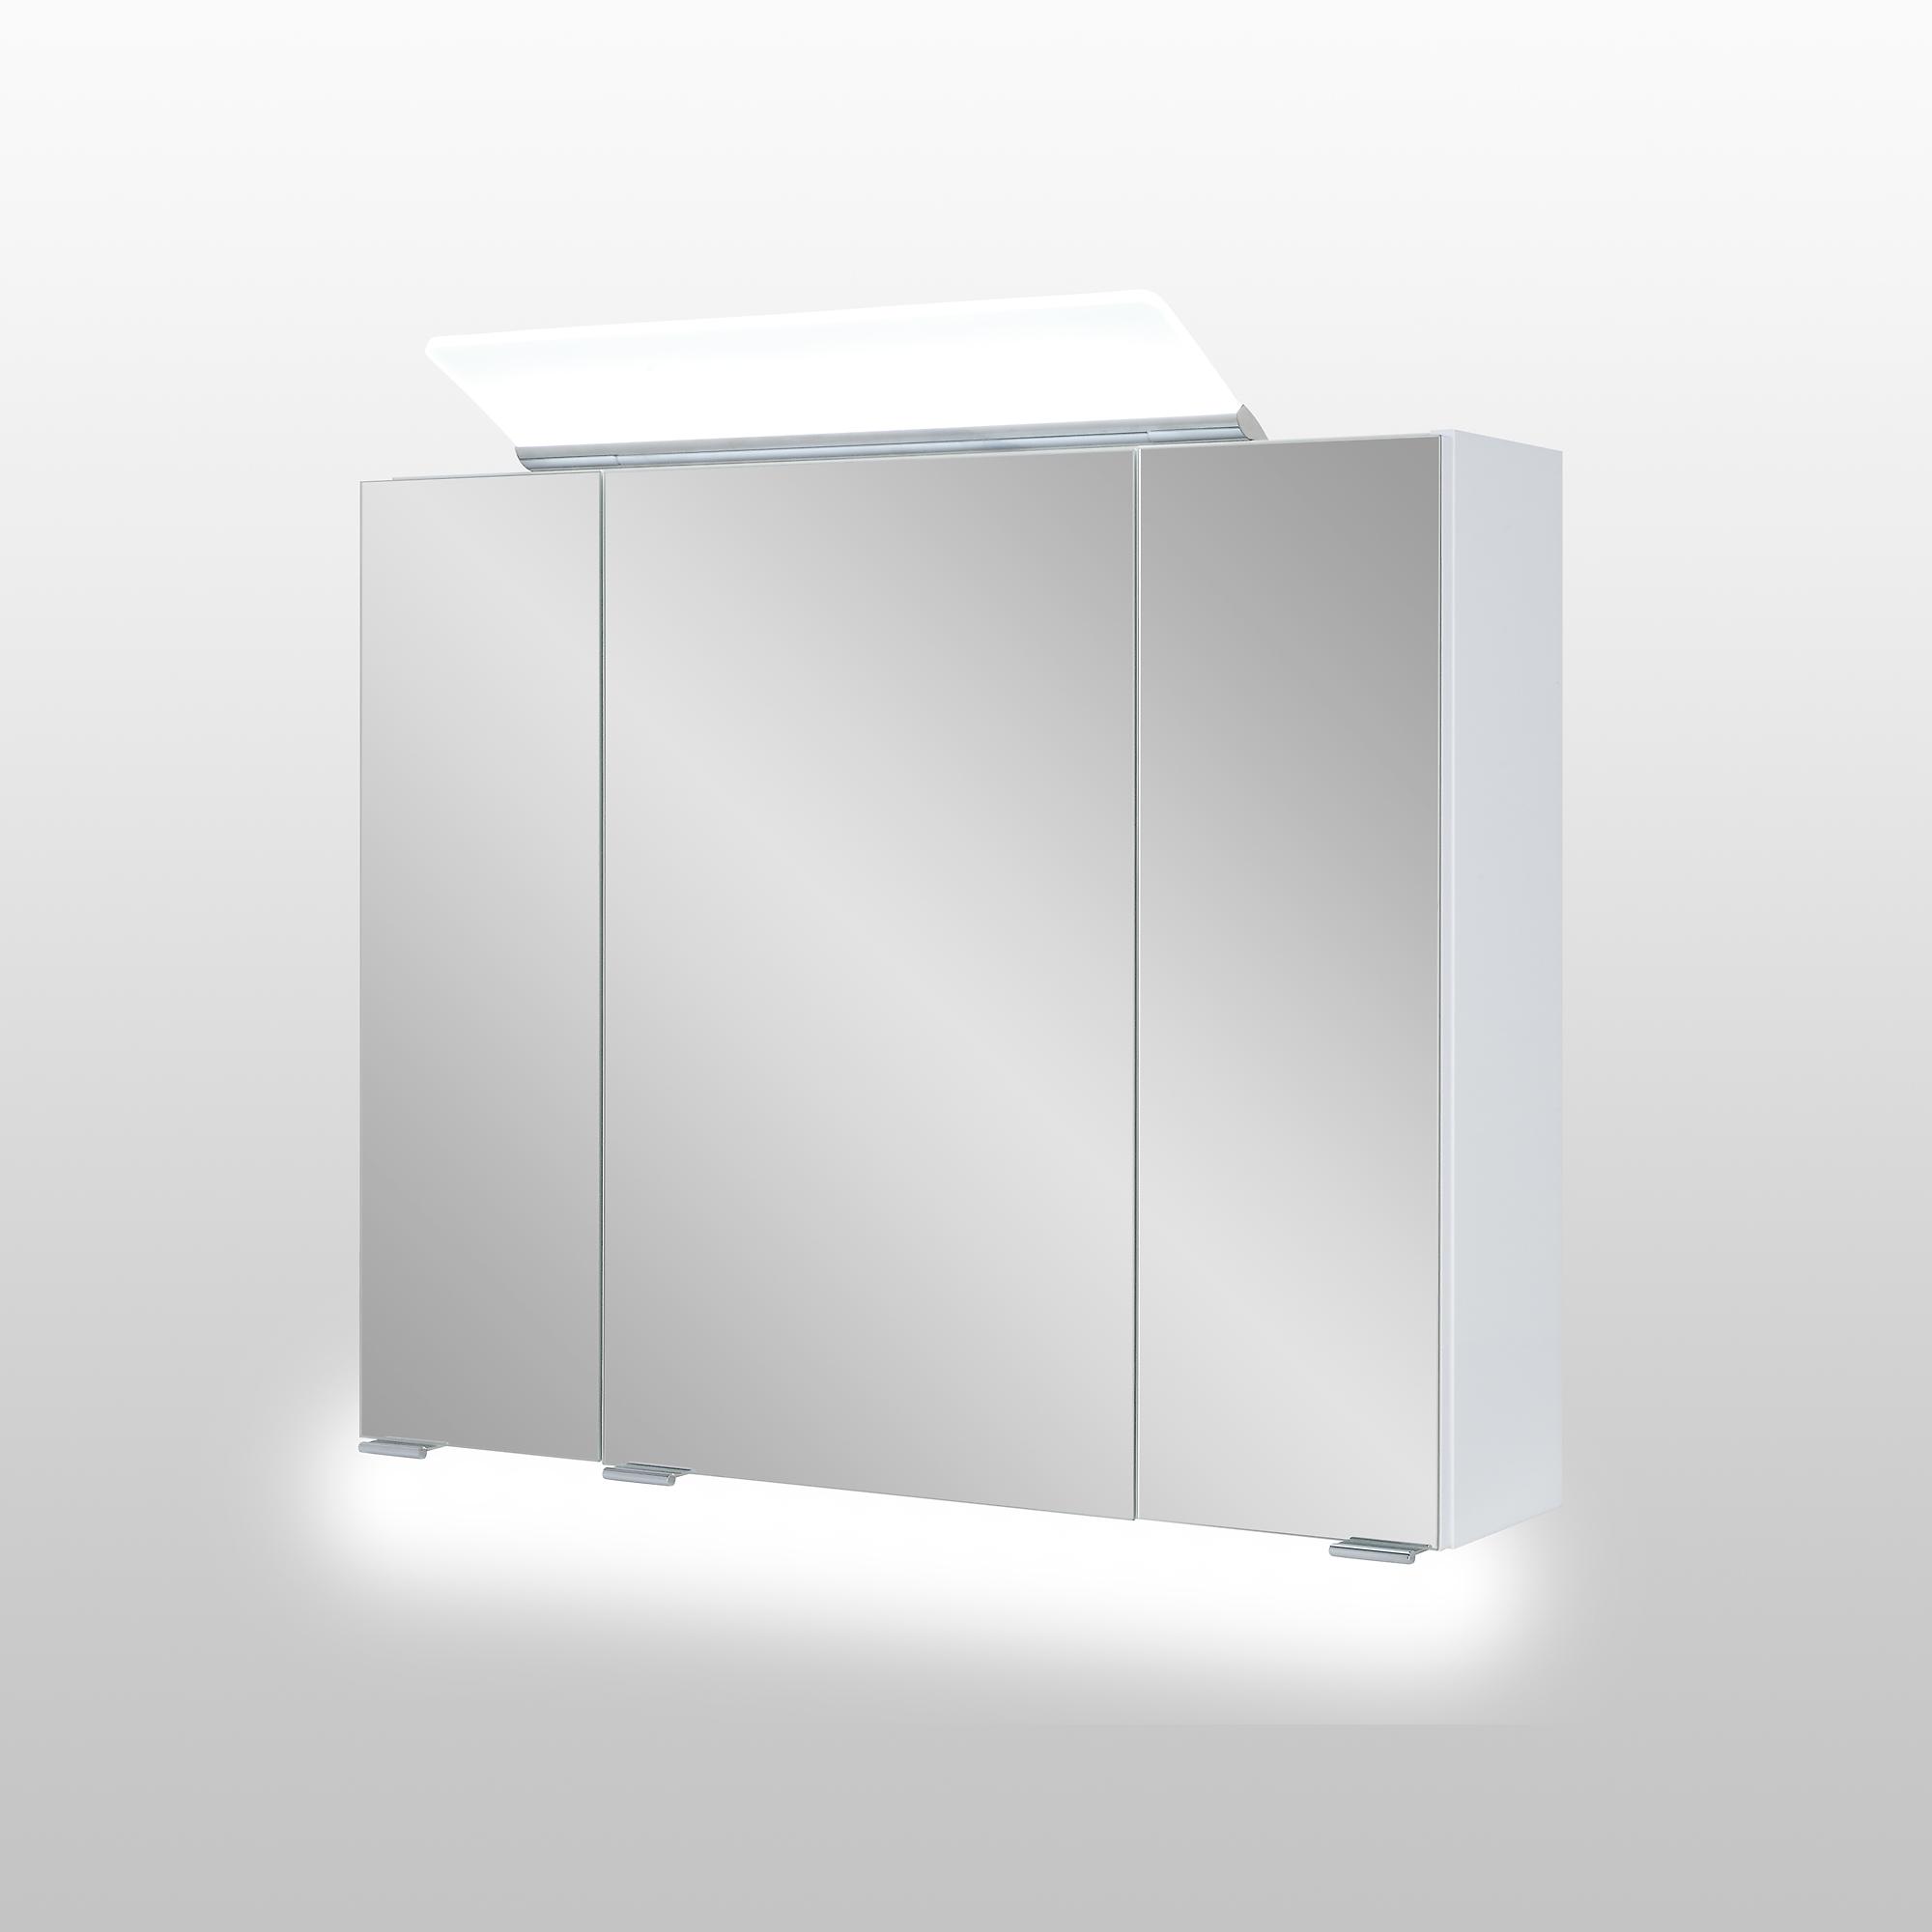 Image of Astor LED-Spiegelschrank 'Lili' 80 x 70 x 16 cm weiß